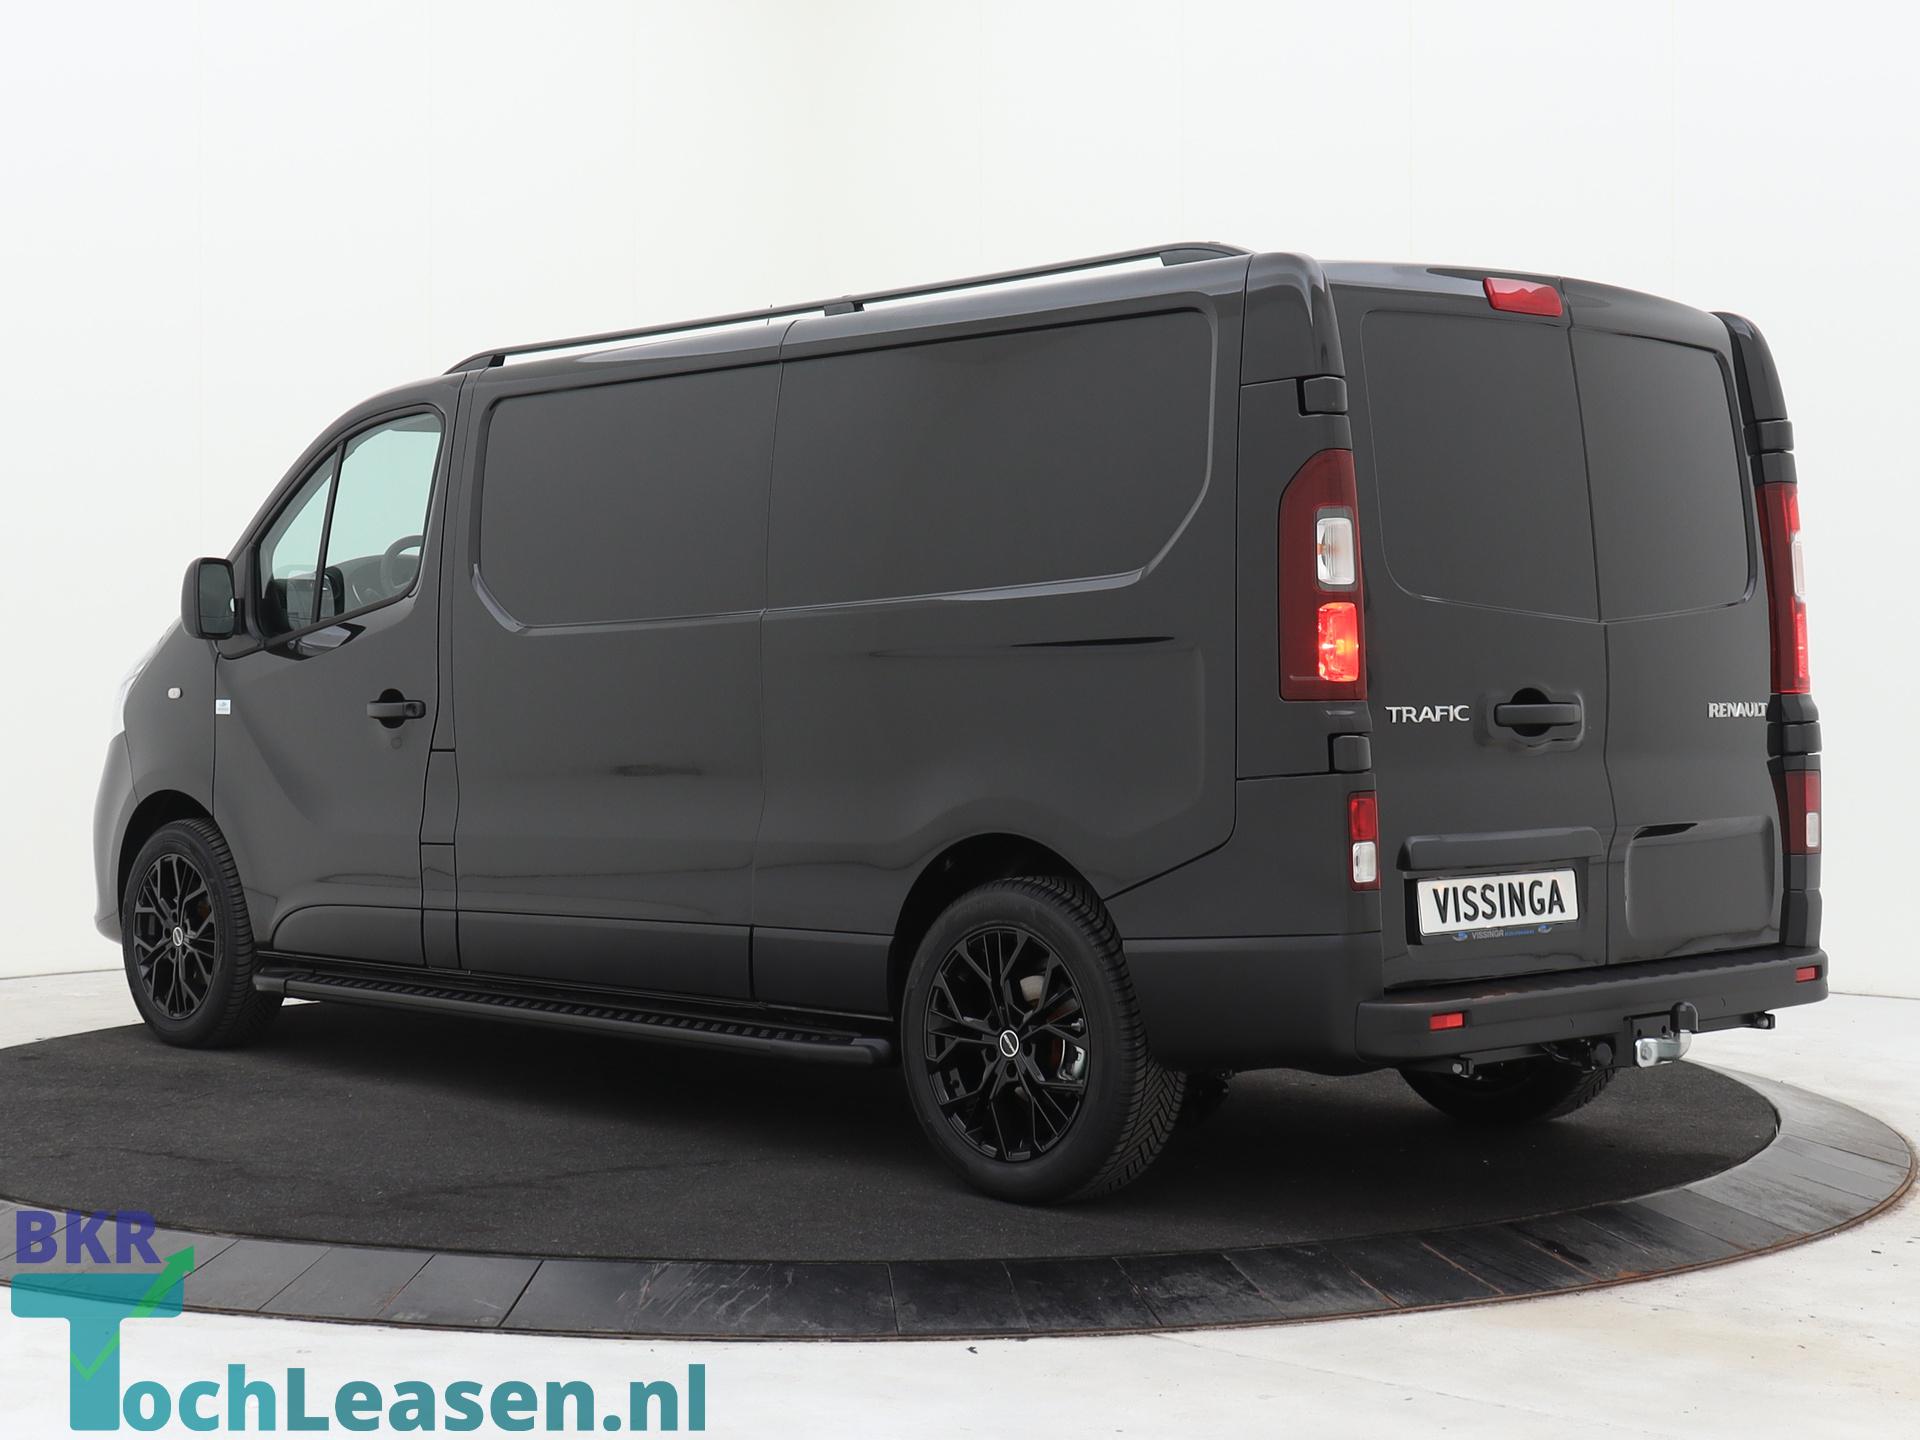 BKRTochLeasen.nl - Renault Trafic - K-Edtion 06